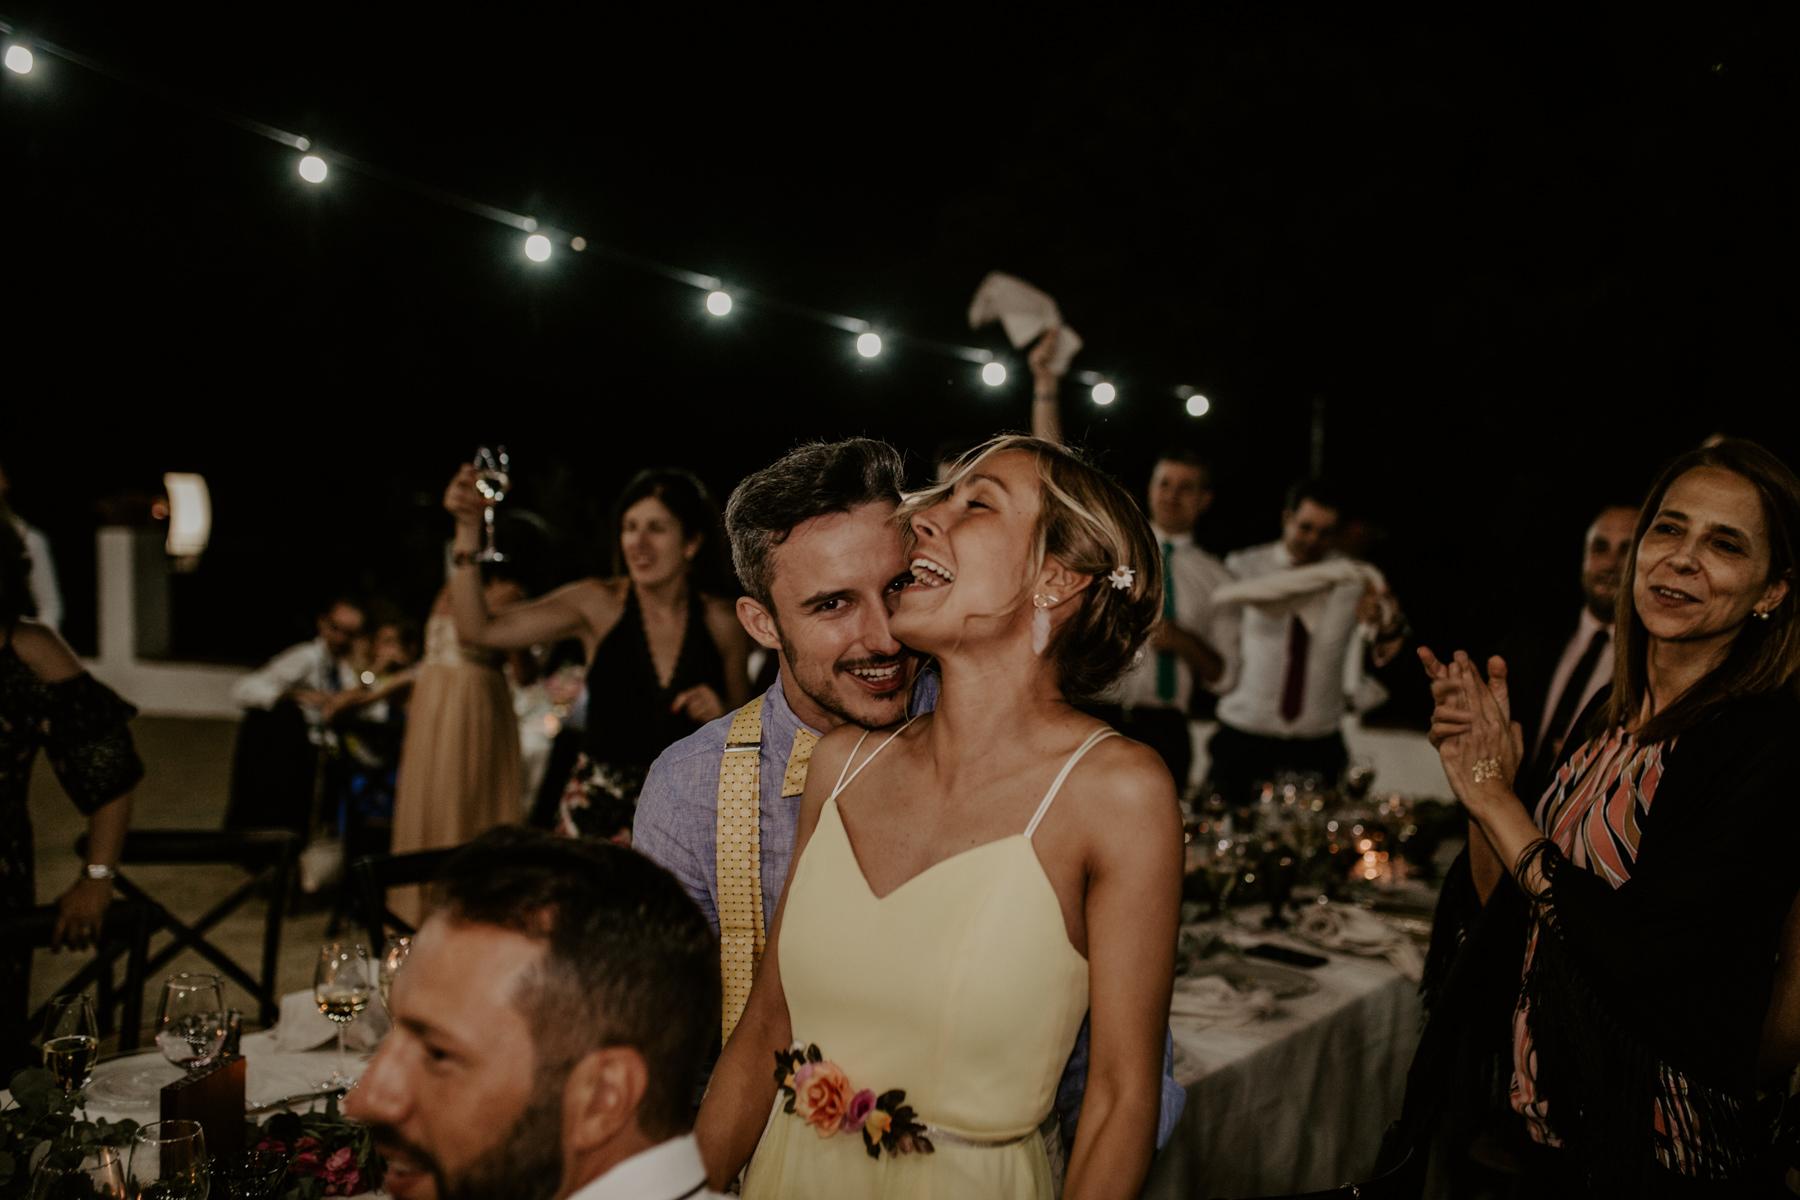 alt_thenortherngirlphotography_couples_weddingphotographer_photographer_wedding_boda_fotografodebodas_fotografobodasbarcelona_bodaindie_bodasconestilo_bodaensantperedeclara_jennifermiguel-842.jpg